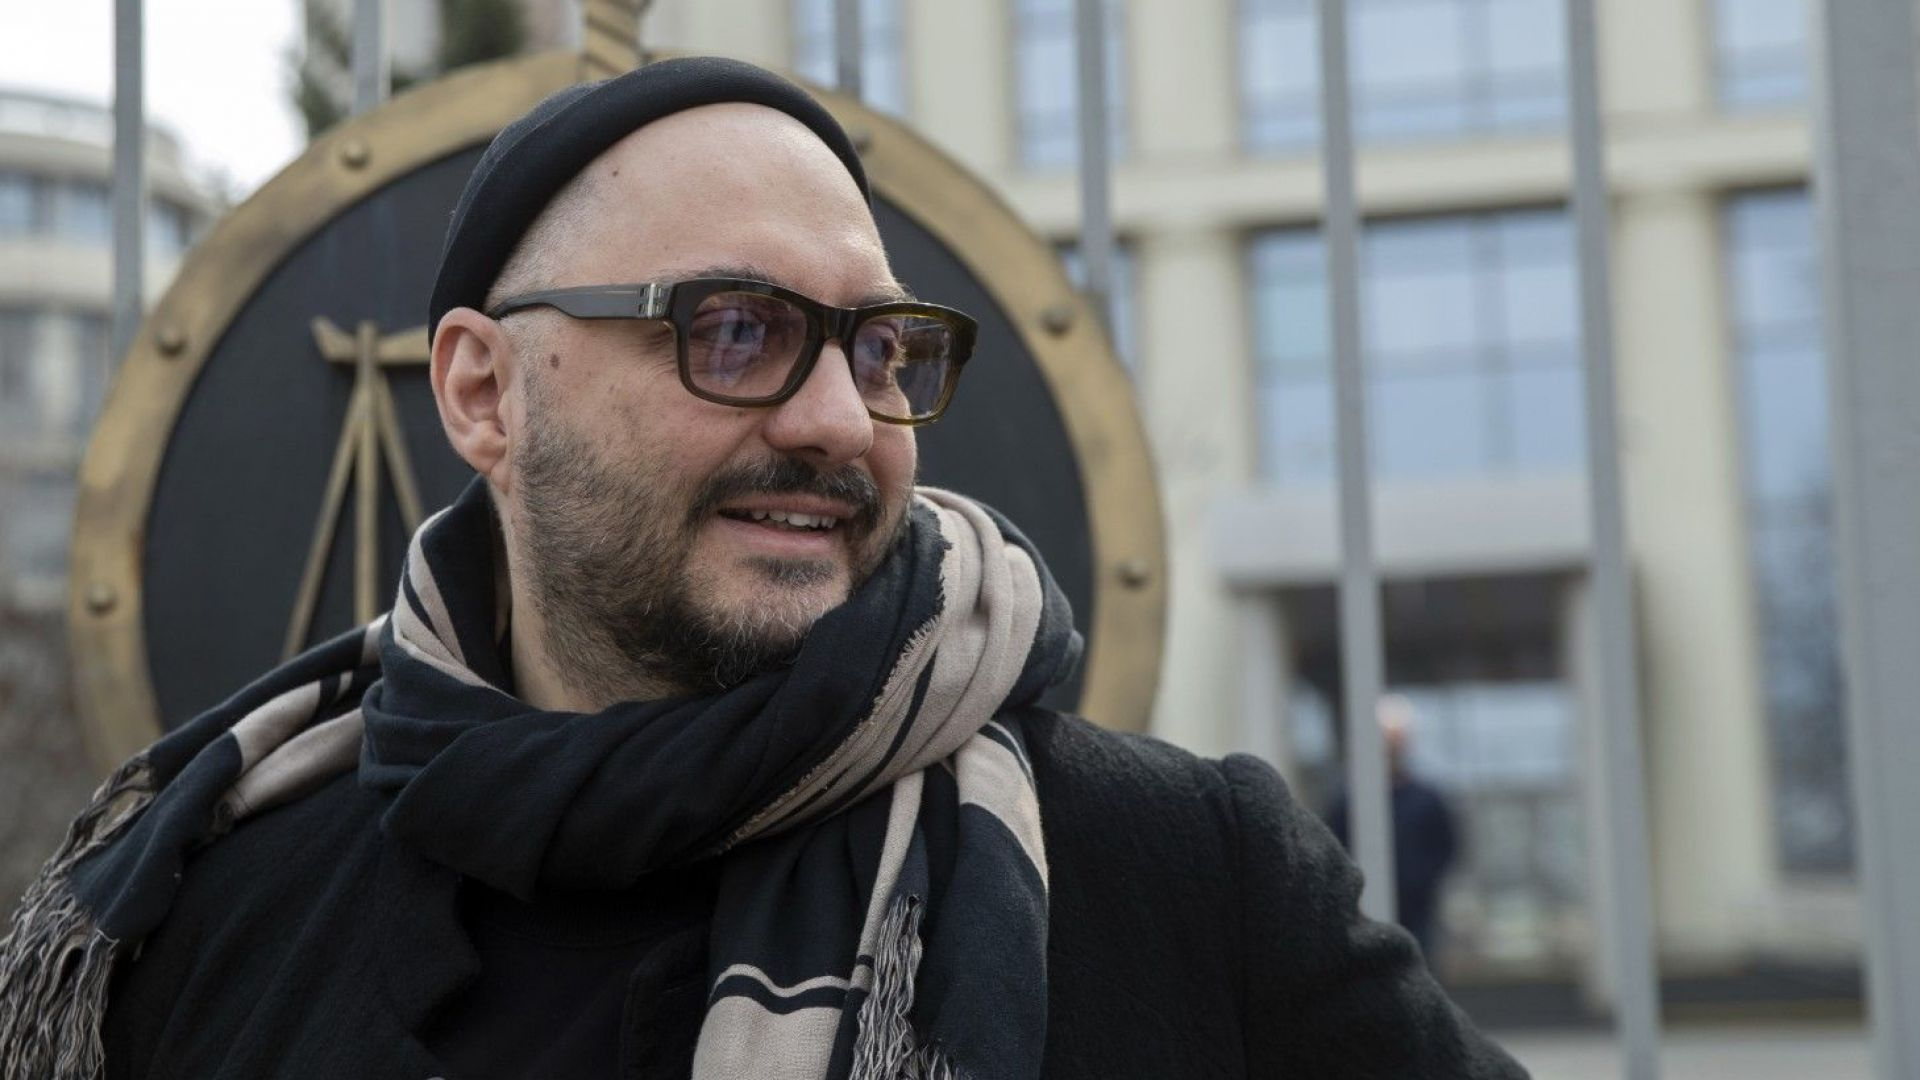 Московски съд освободи от домашния арест руския режисьор Кирил Серебренников